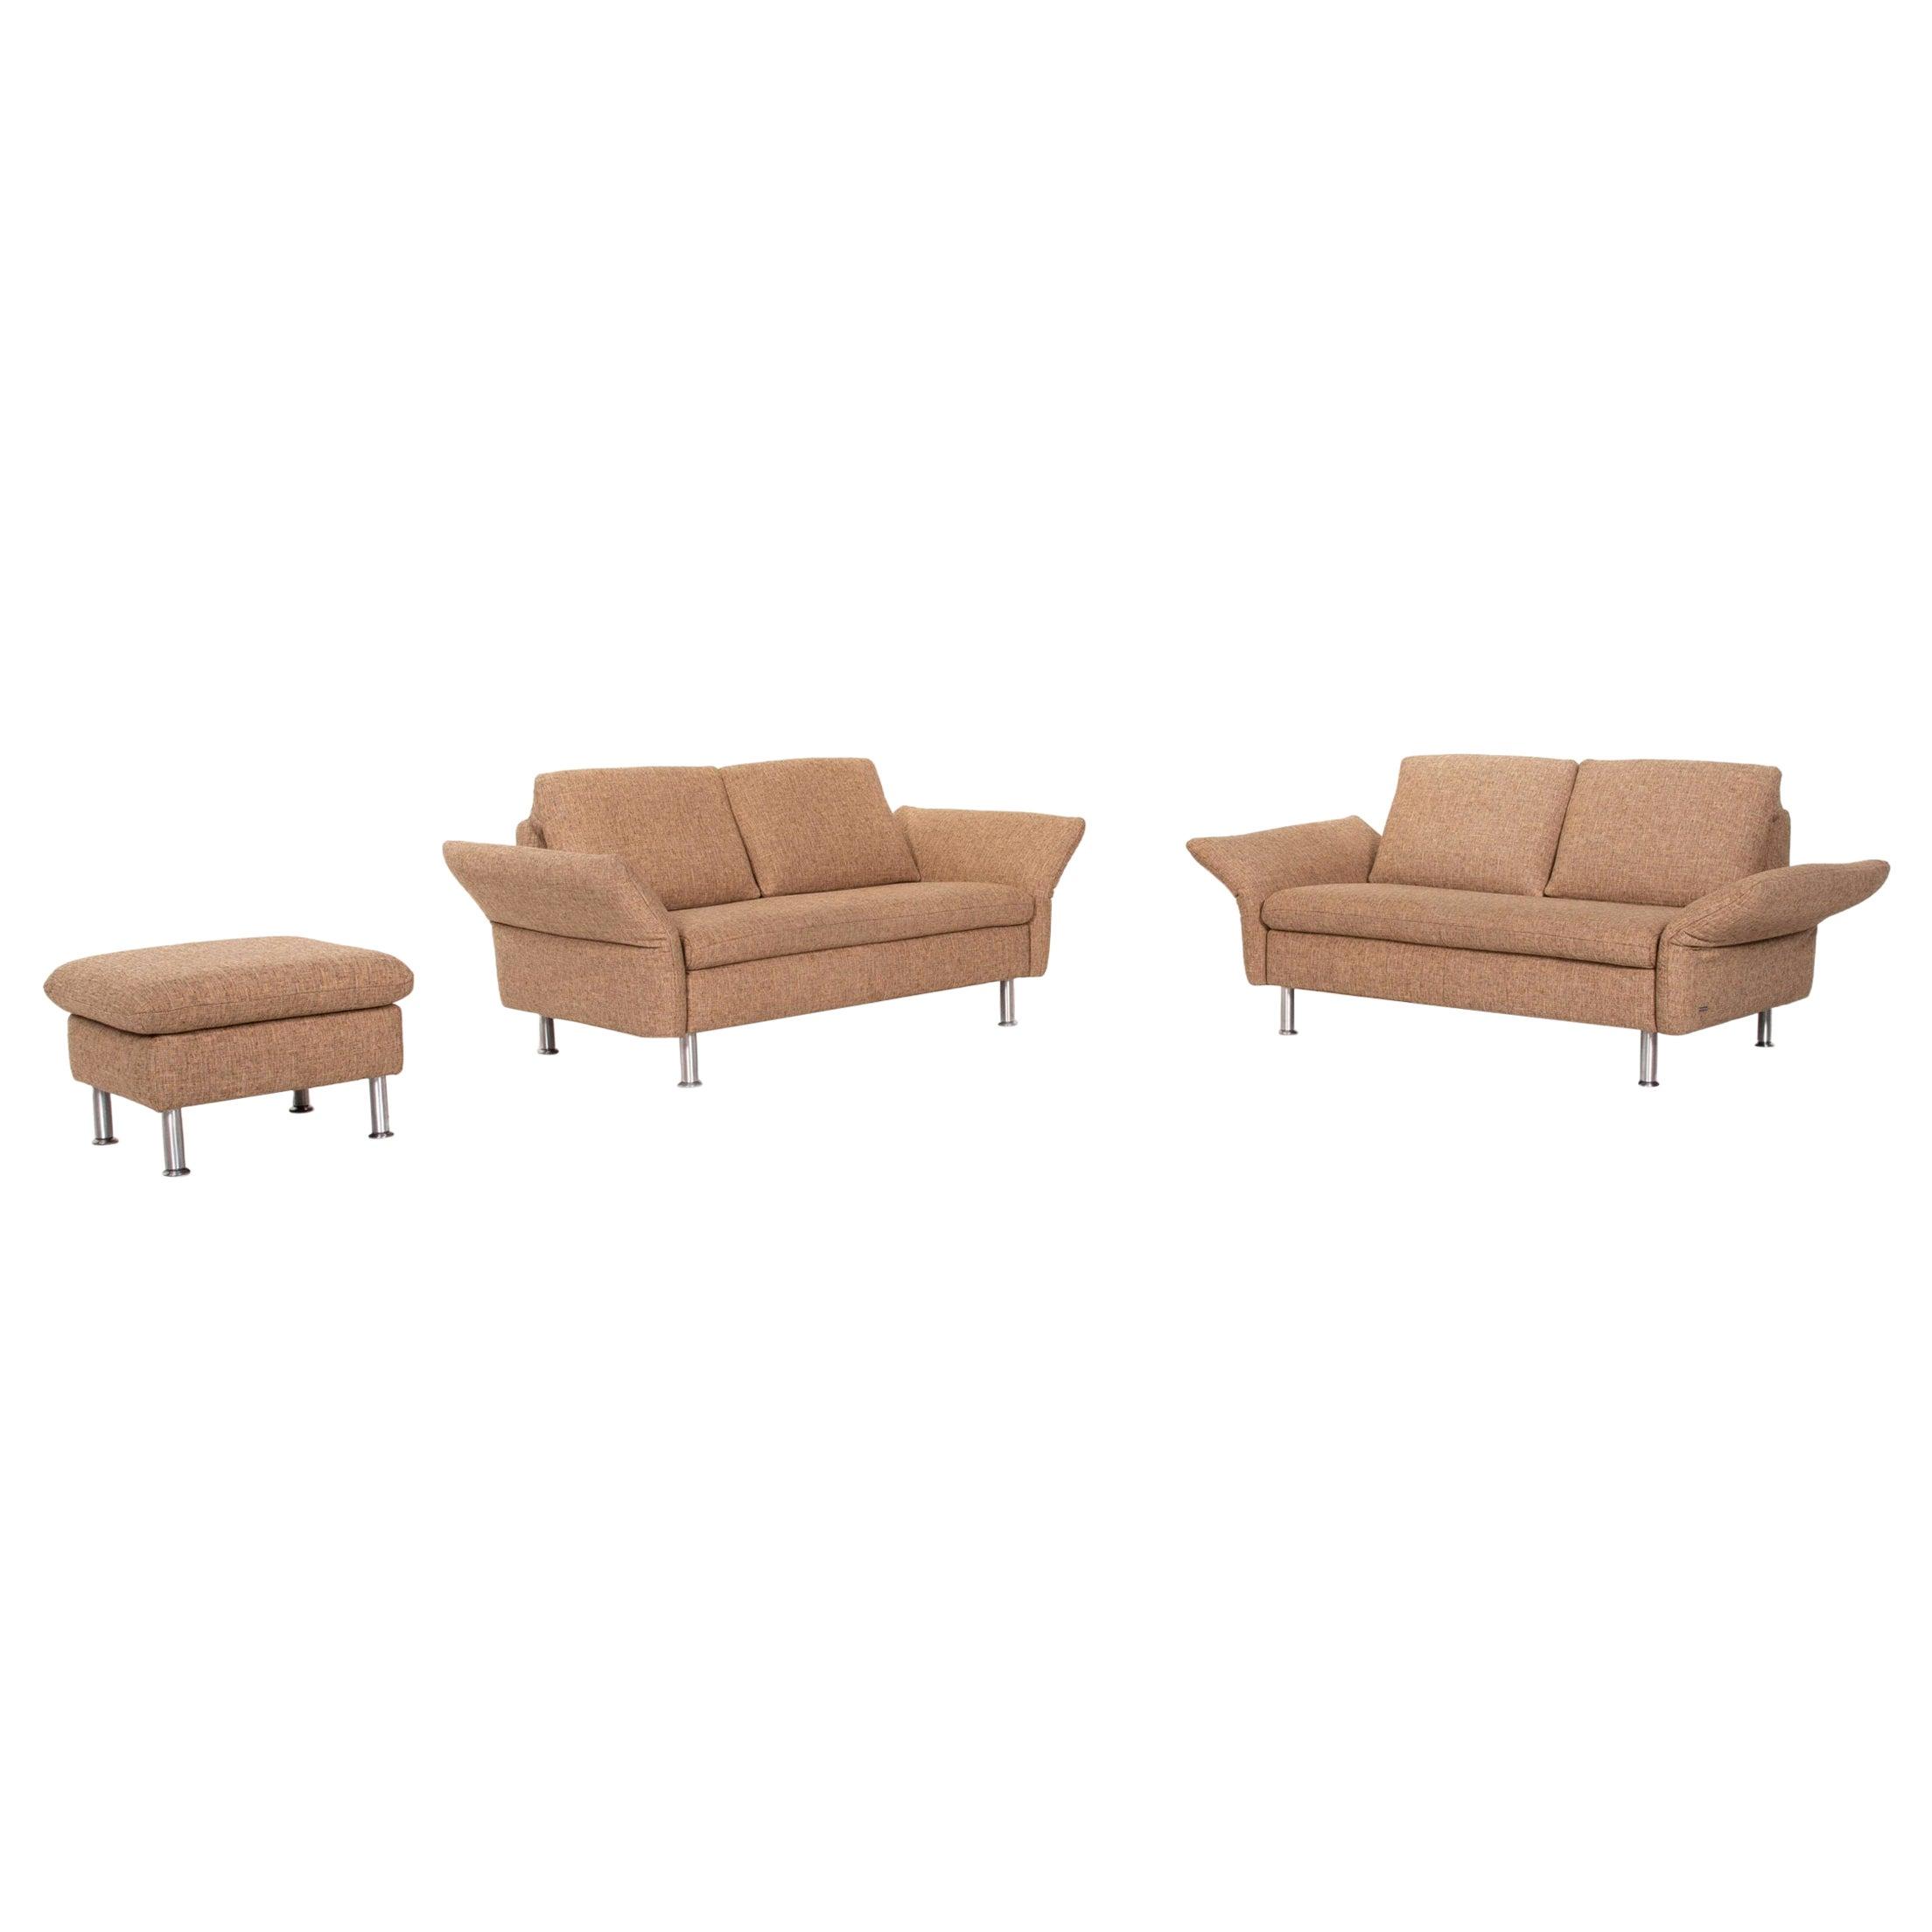 Koinor Vittoria Fabric Sofa Set Beige 2x Two-Seater 1x Stool Function